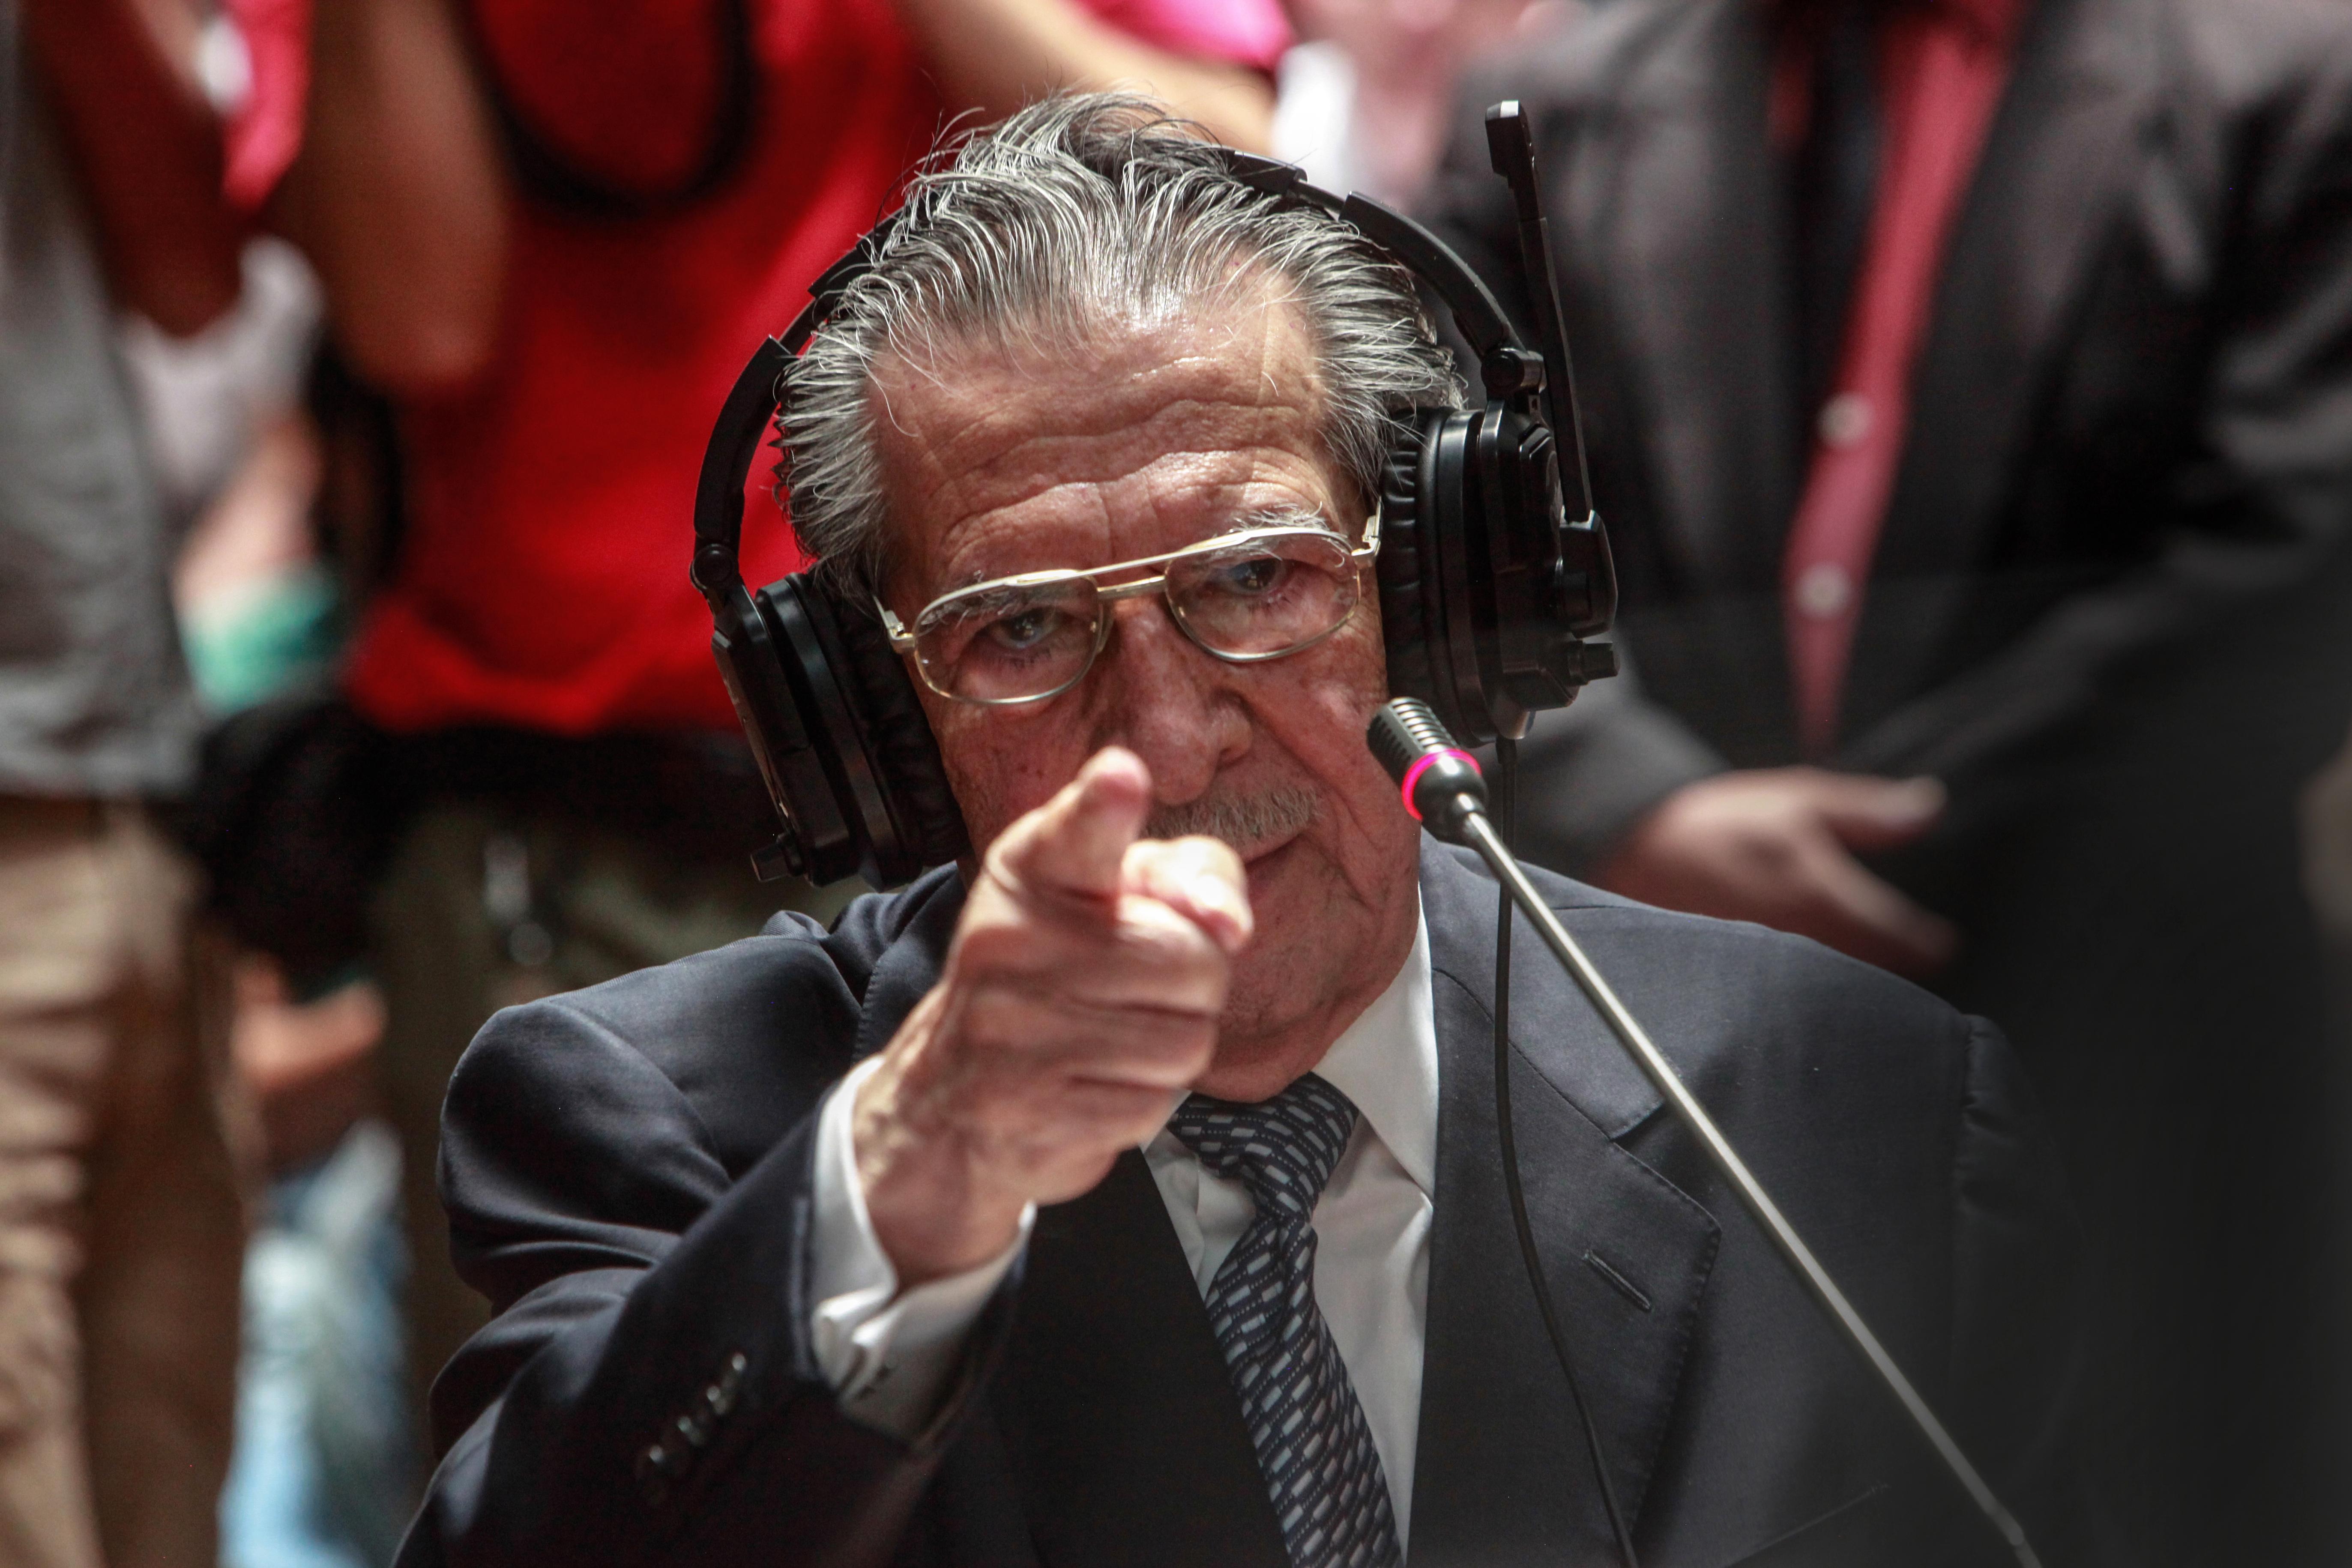 TRAILER: 'El Buen Cristiano' Doc Highlights the Religious Hypocrisy of Guatemala's Bloody Dictator